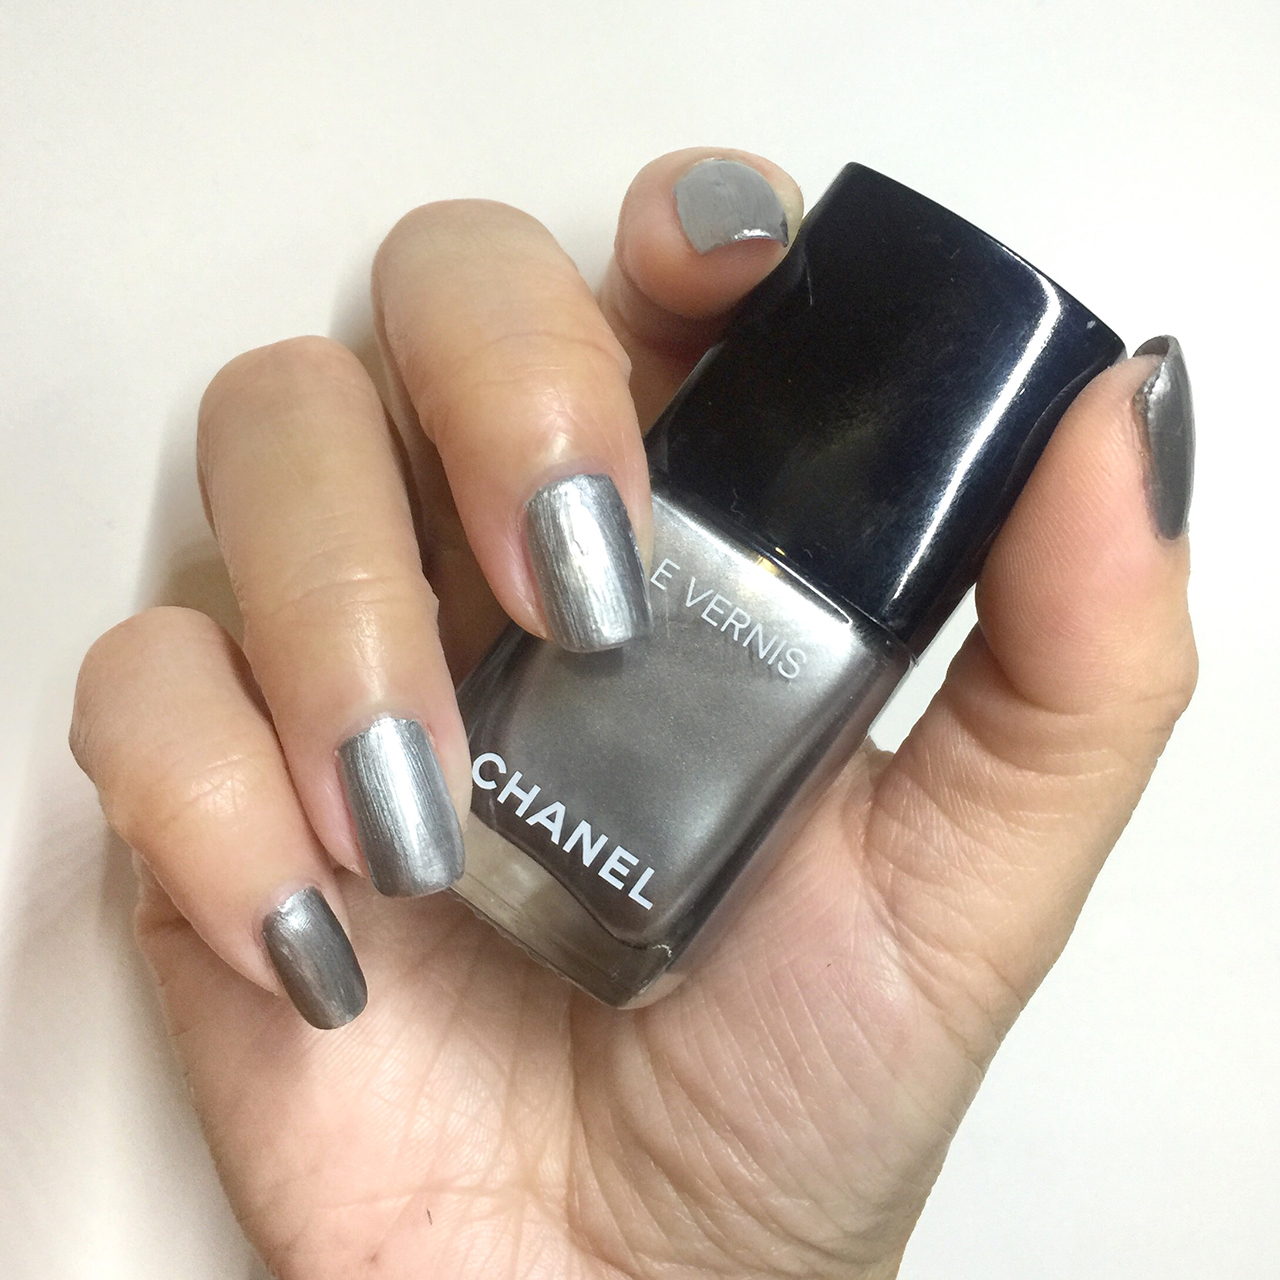 Chanel Le Vernis Liquid Mirror nail swatch